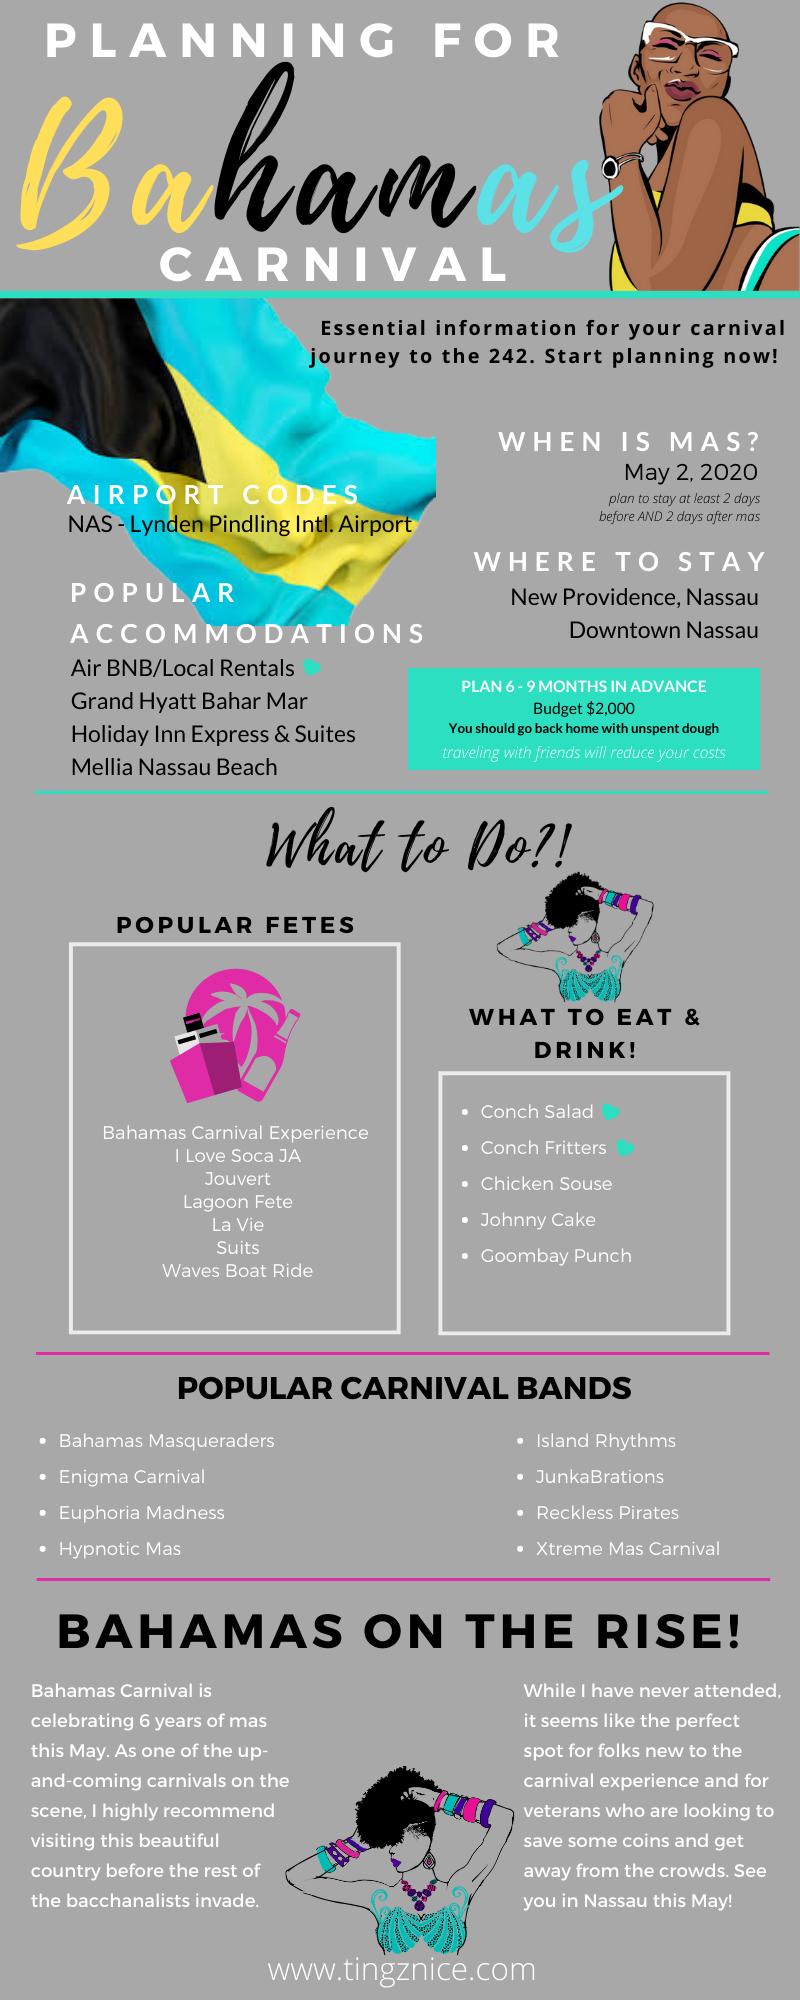 TN Bahamas Info-graphic